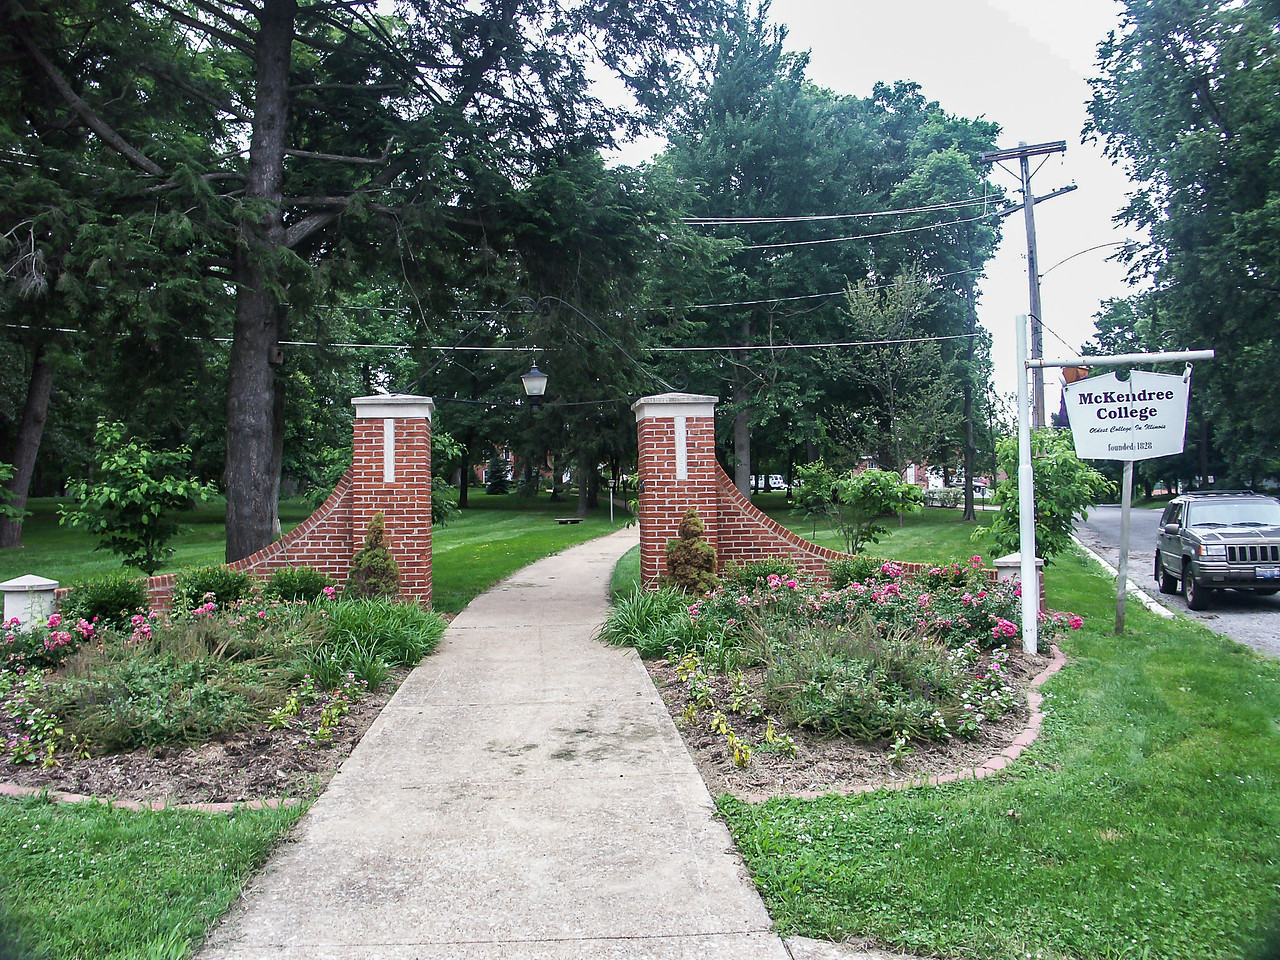 McKendree College